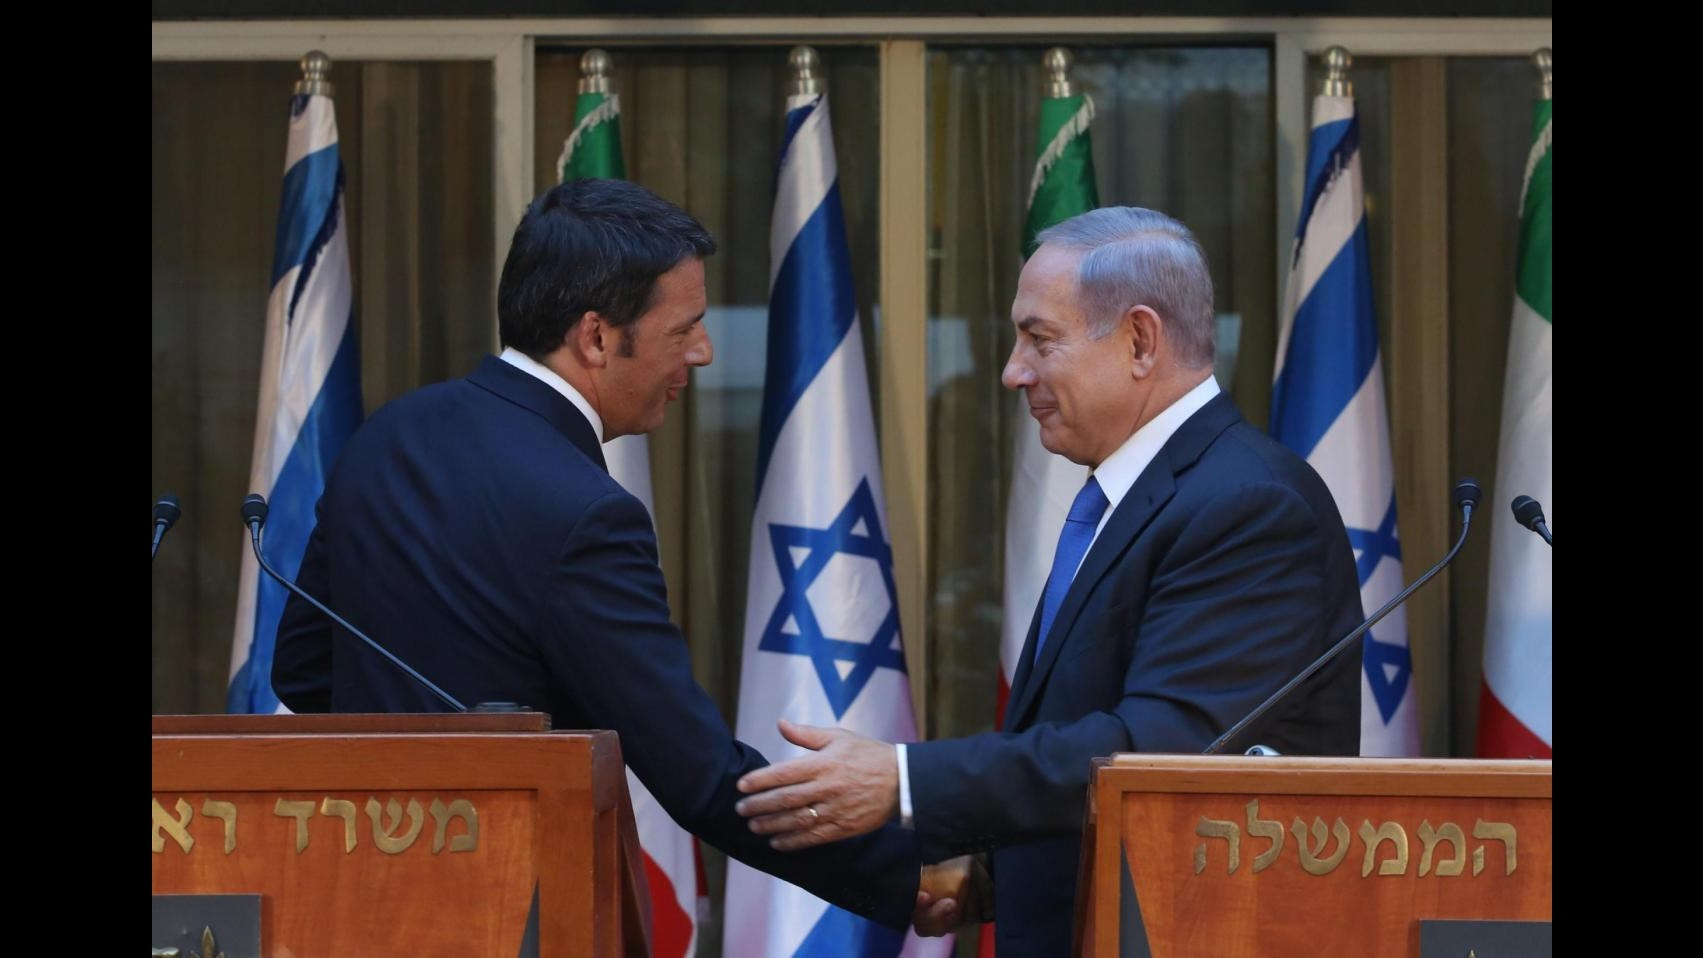 Renzi: Boicottare Israele è stupido. Soluzione è due popoli, due Stati